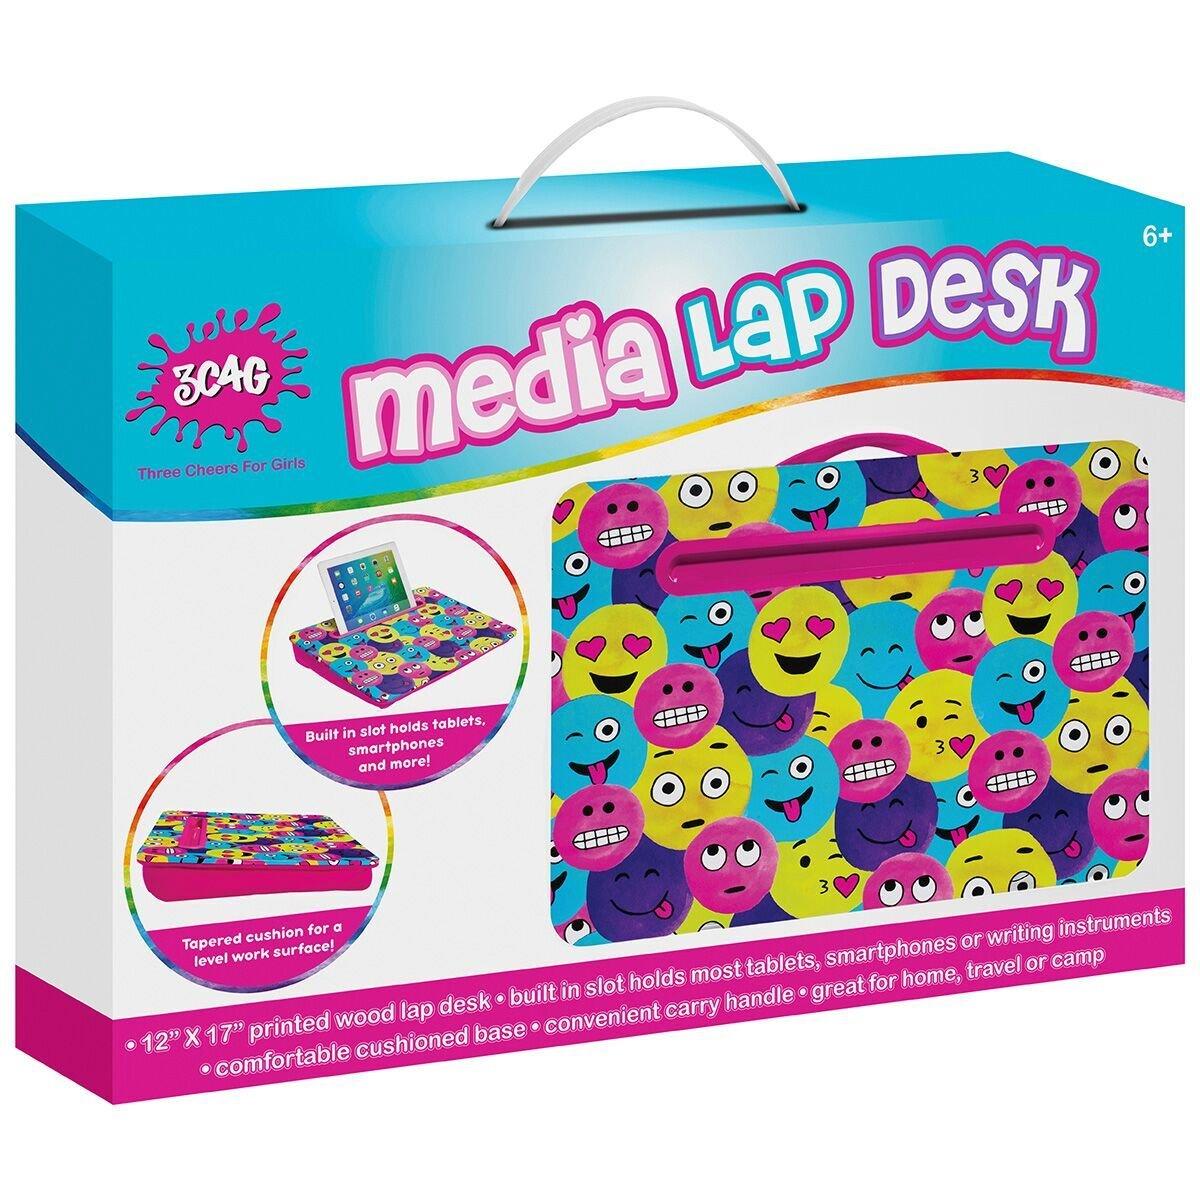 3C4G Emoji Crowd Media Lap Desk (35981)